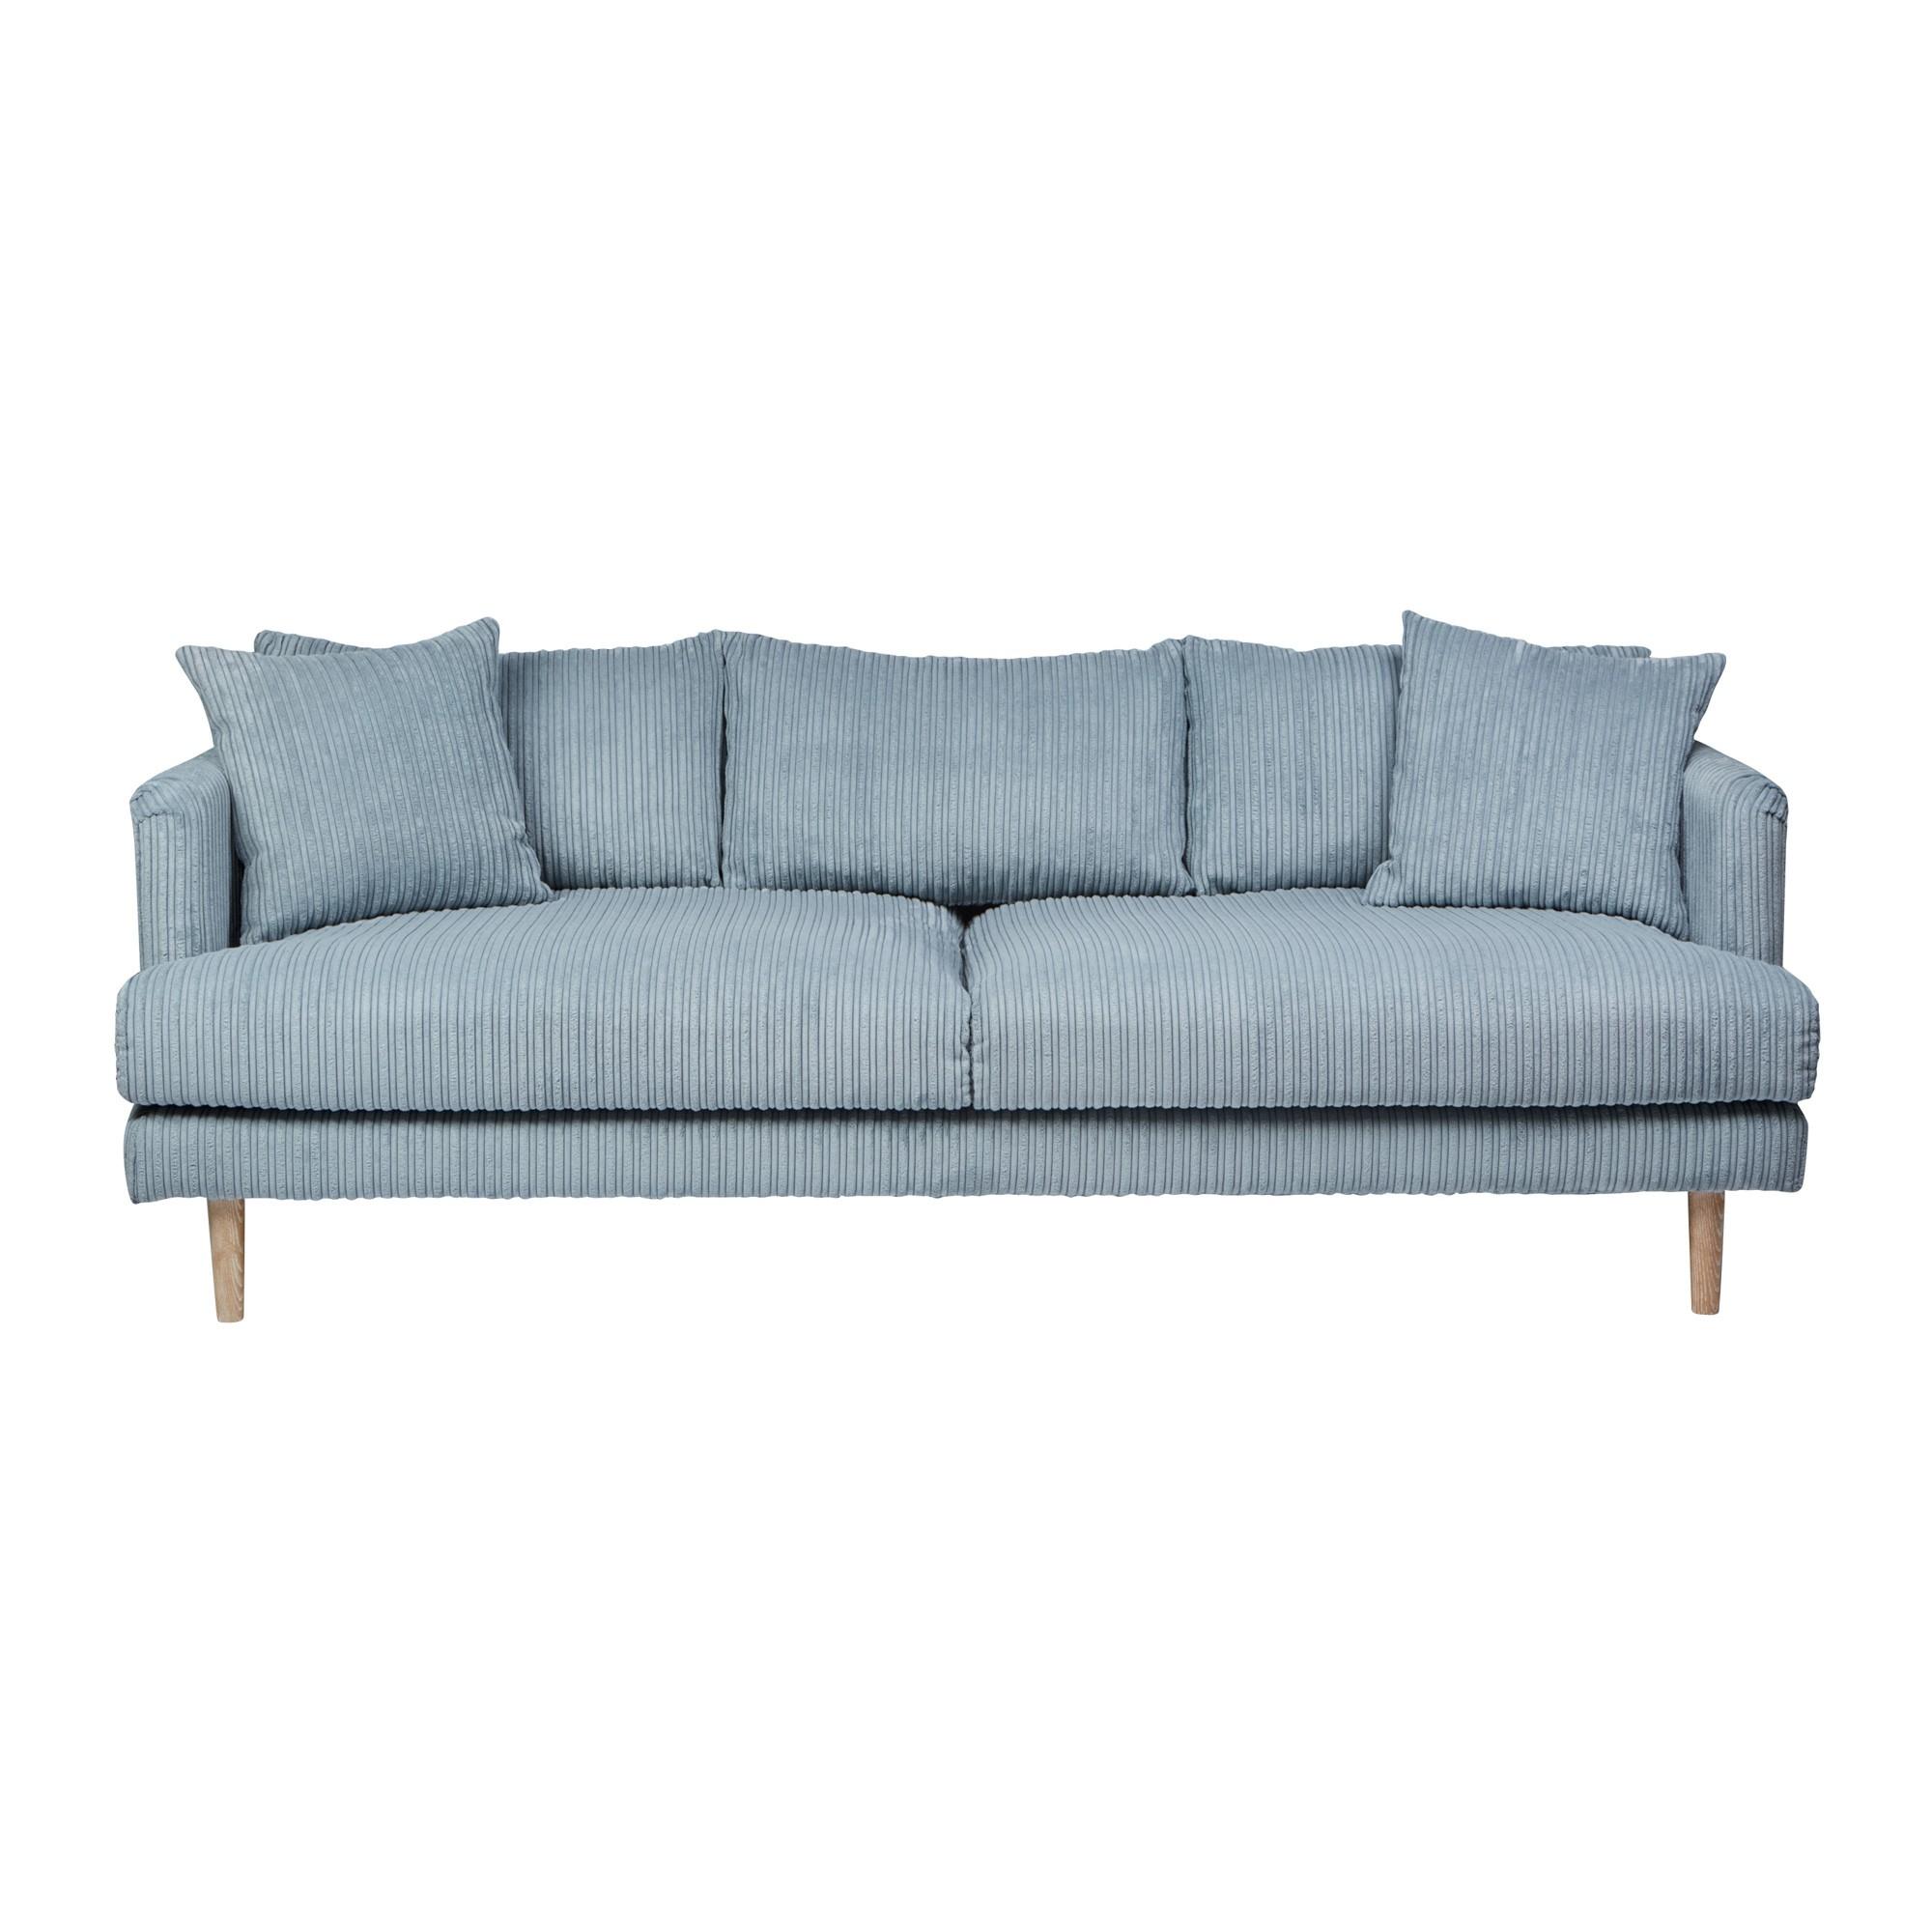 Capetown Ribcord Fabric Sofa, 3 Seater, Aqua